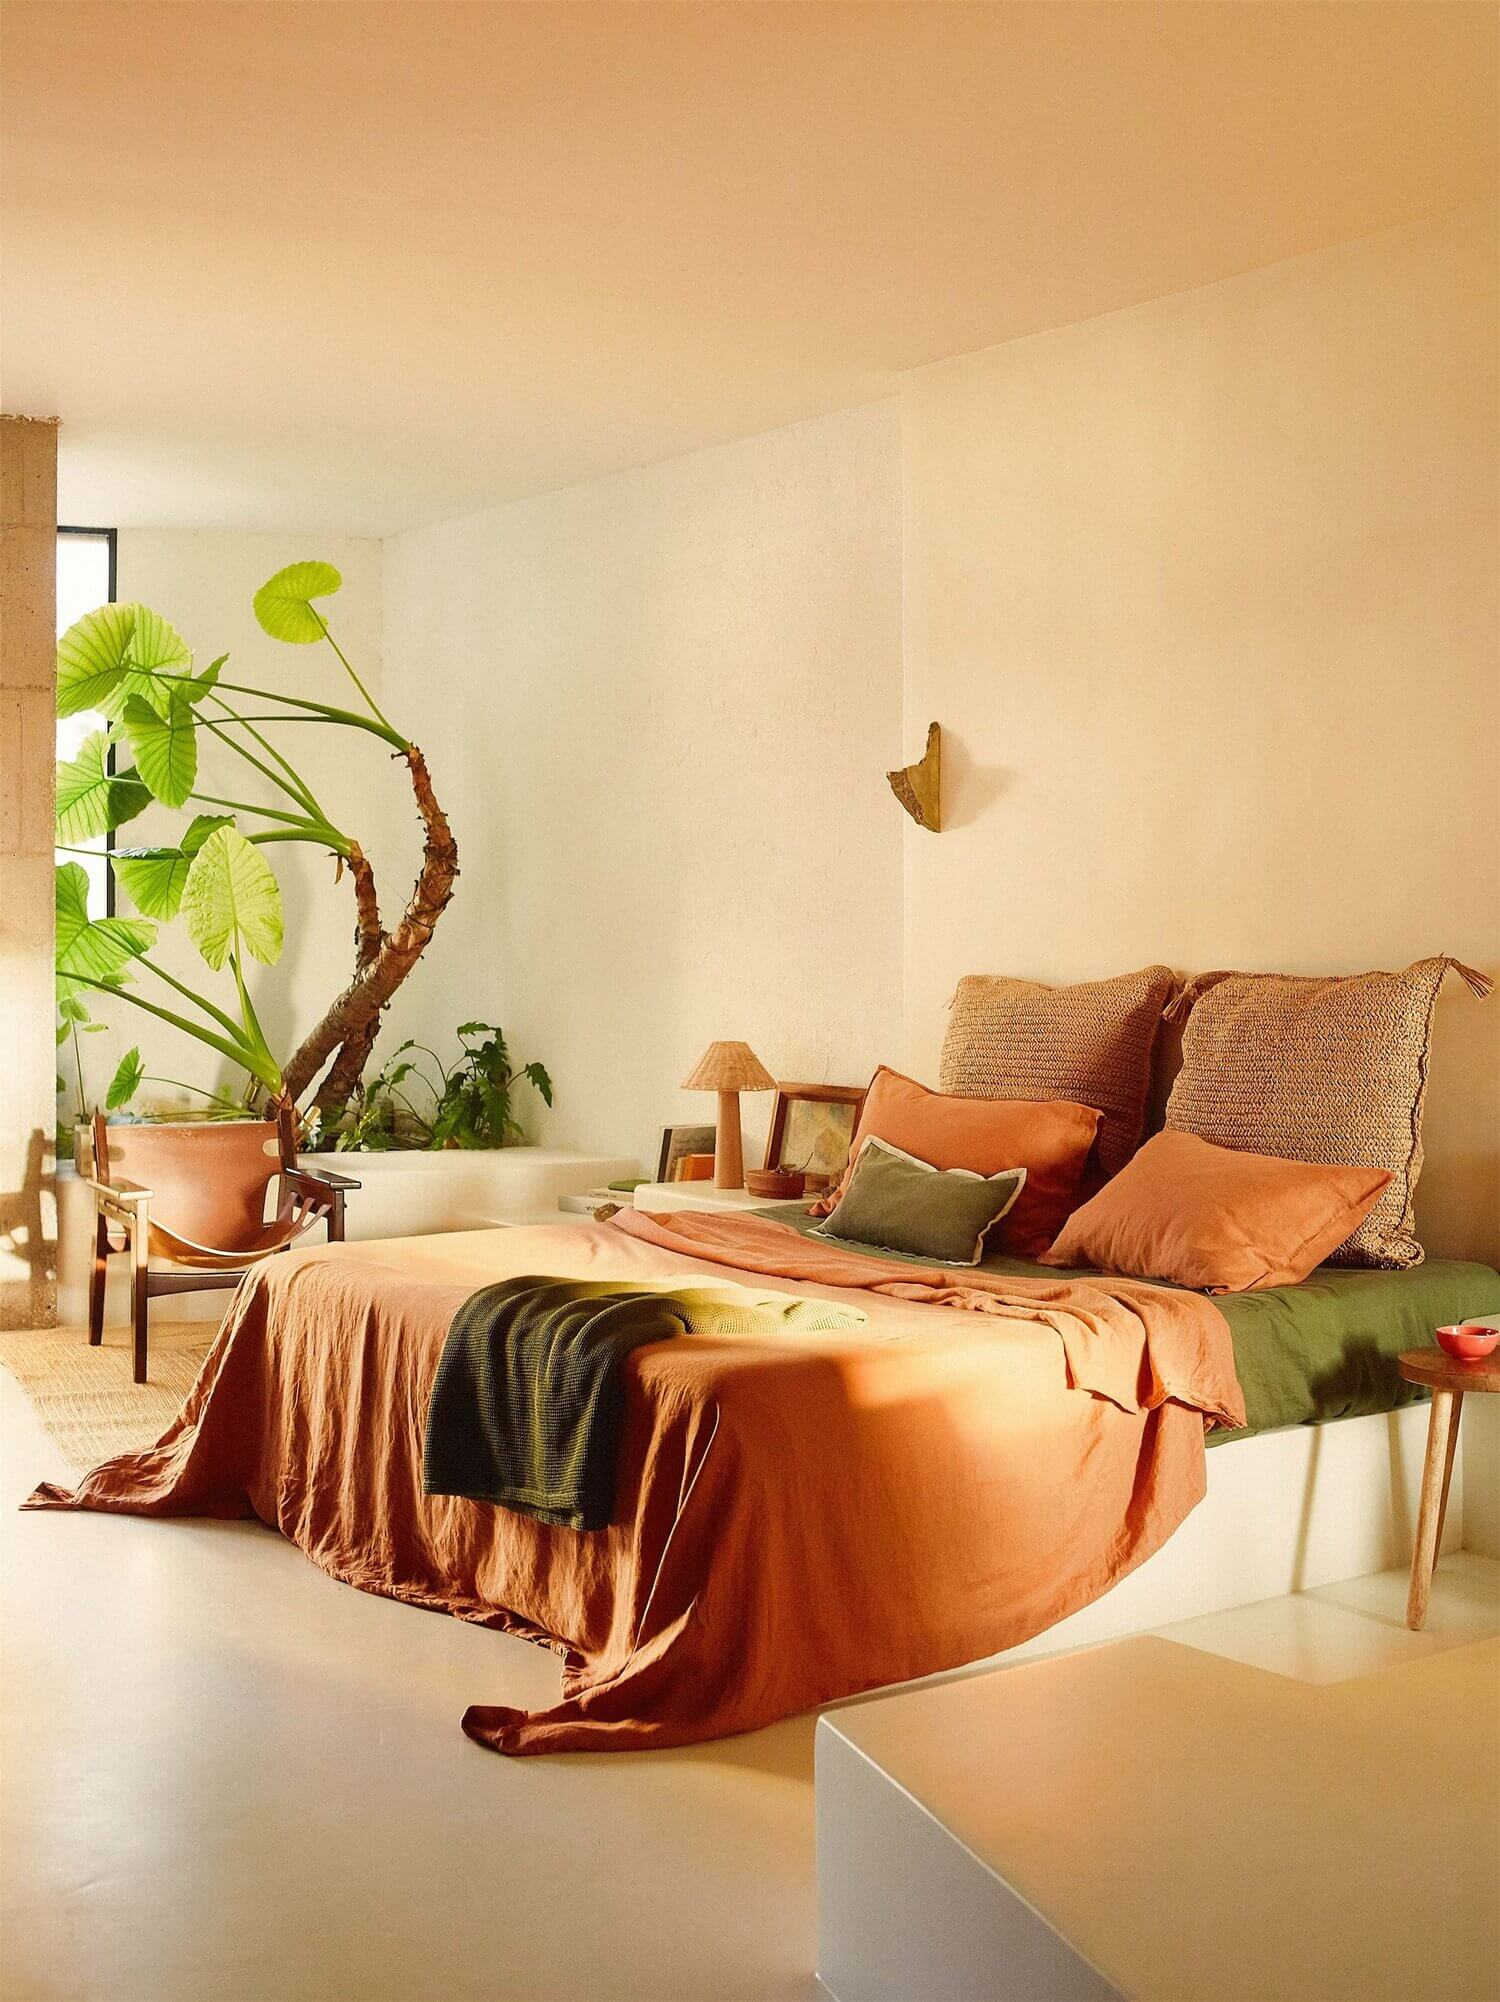 A Mediterranean Home by Cobalto Studio x Zara Home